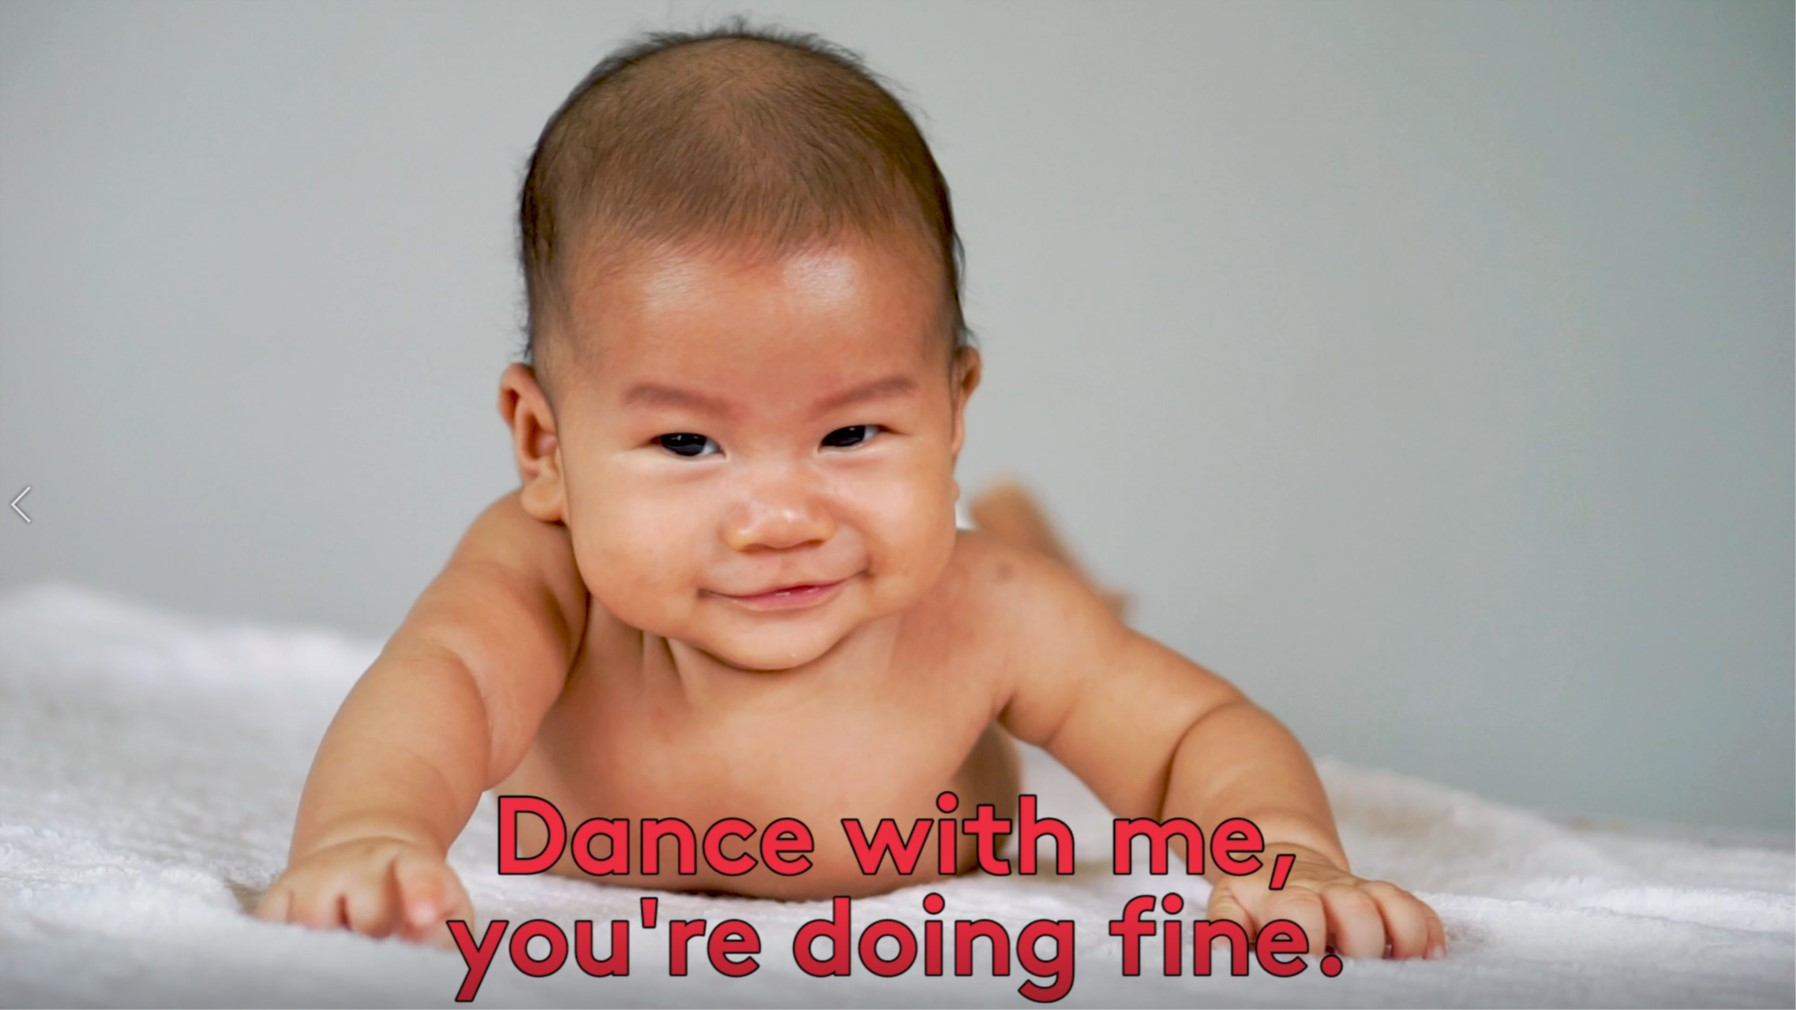 dance-with-me.JPG